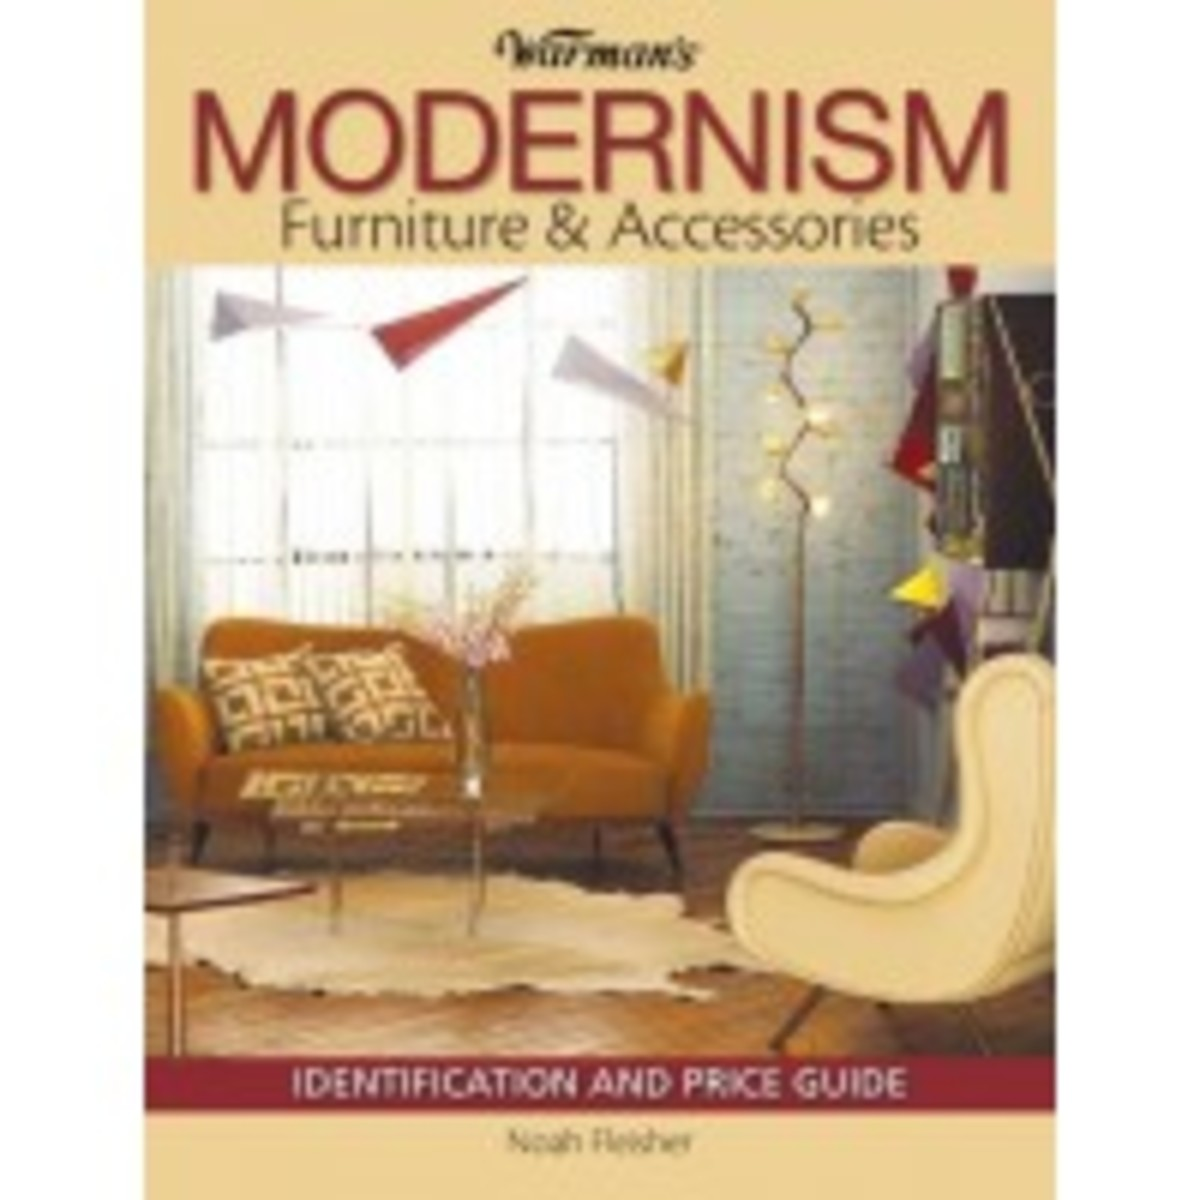 Warman's Modernism Furniture & Accessories